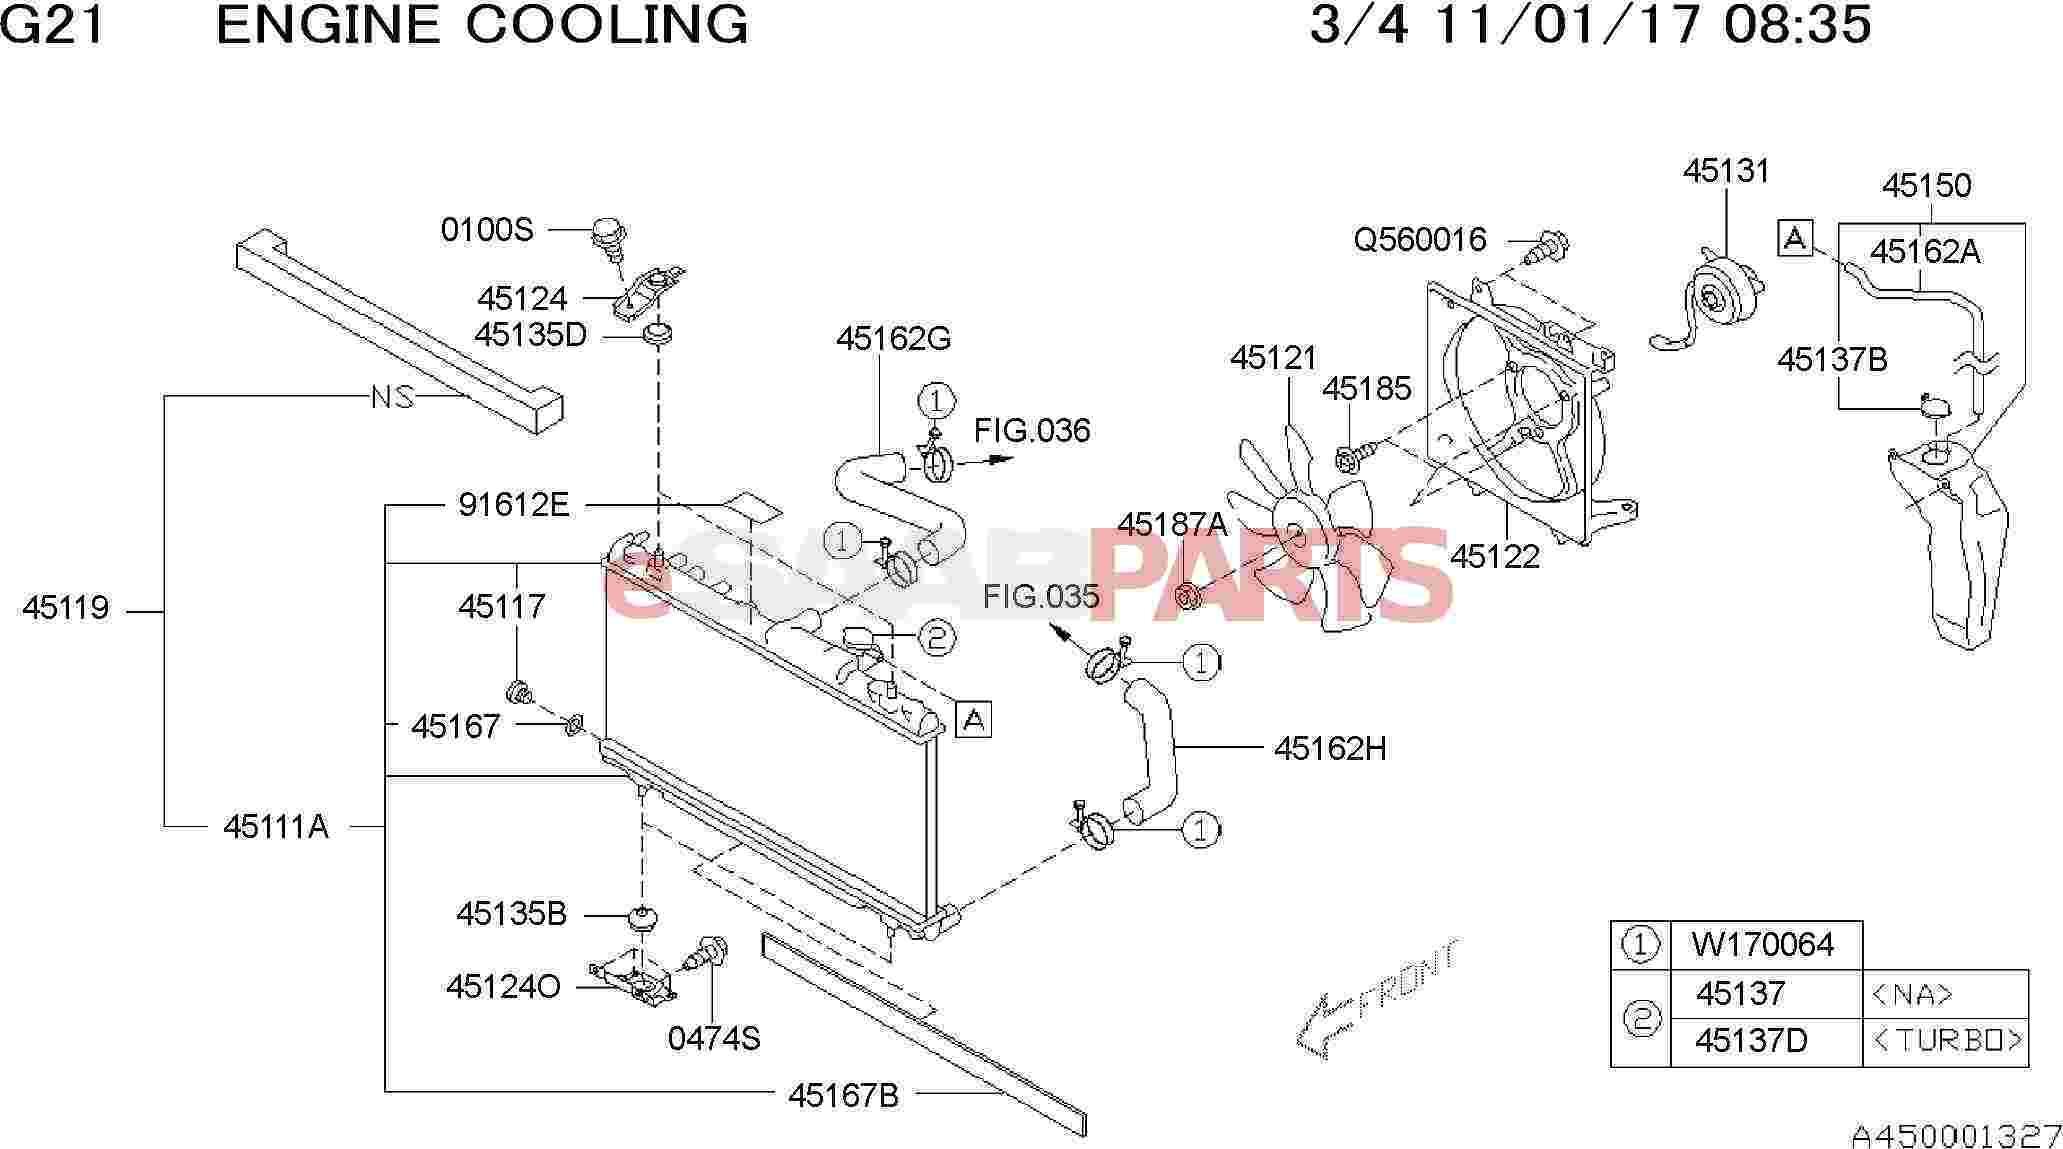 2003 isuzu ascender wiring diagram auto electrical wiring diagram 2005 isuzu ascender fuse box diagram 1997 isuzu rodeo fuse